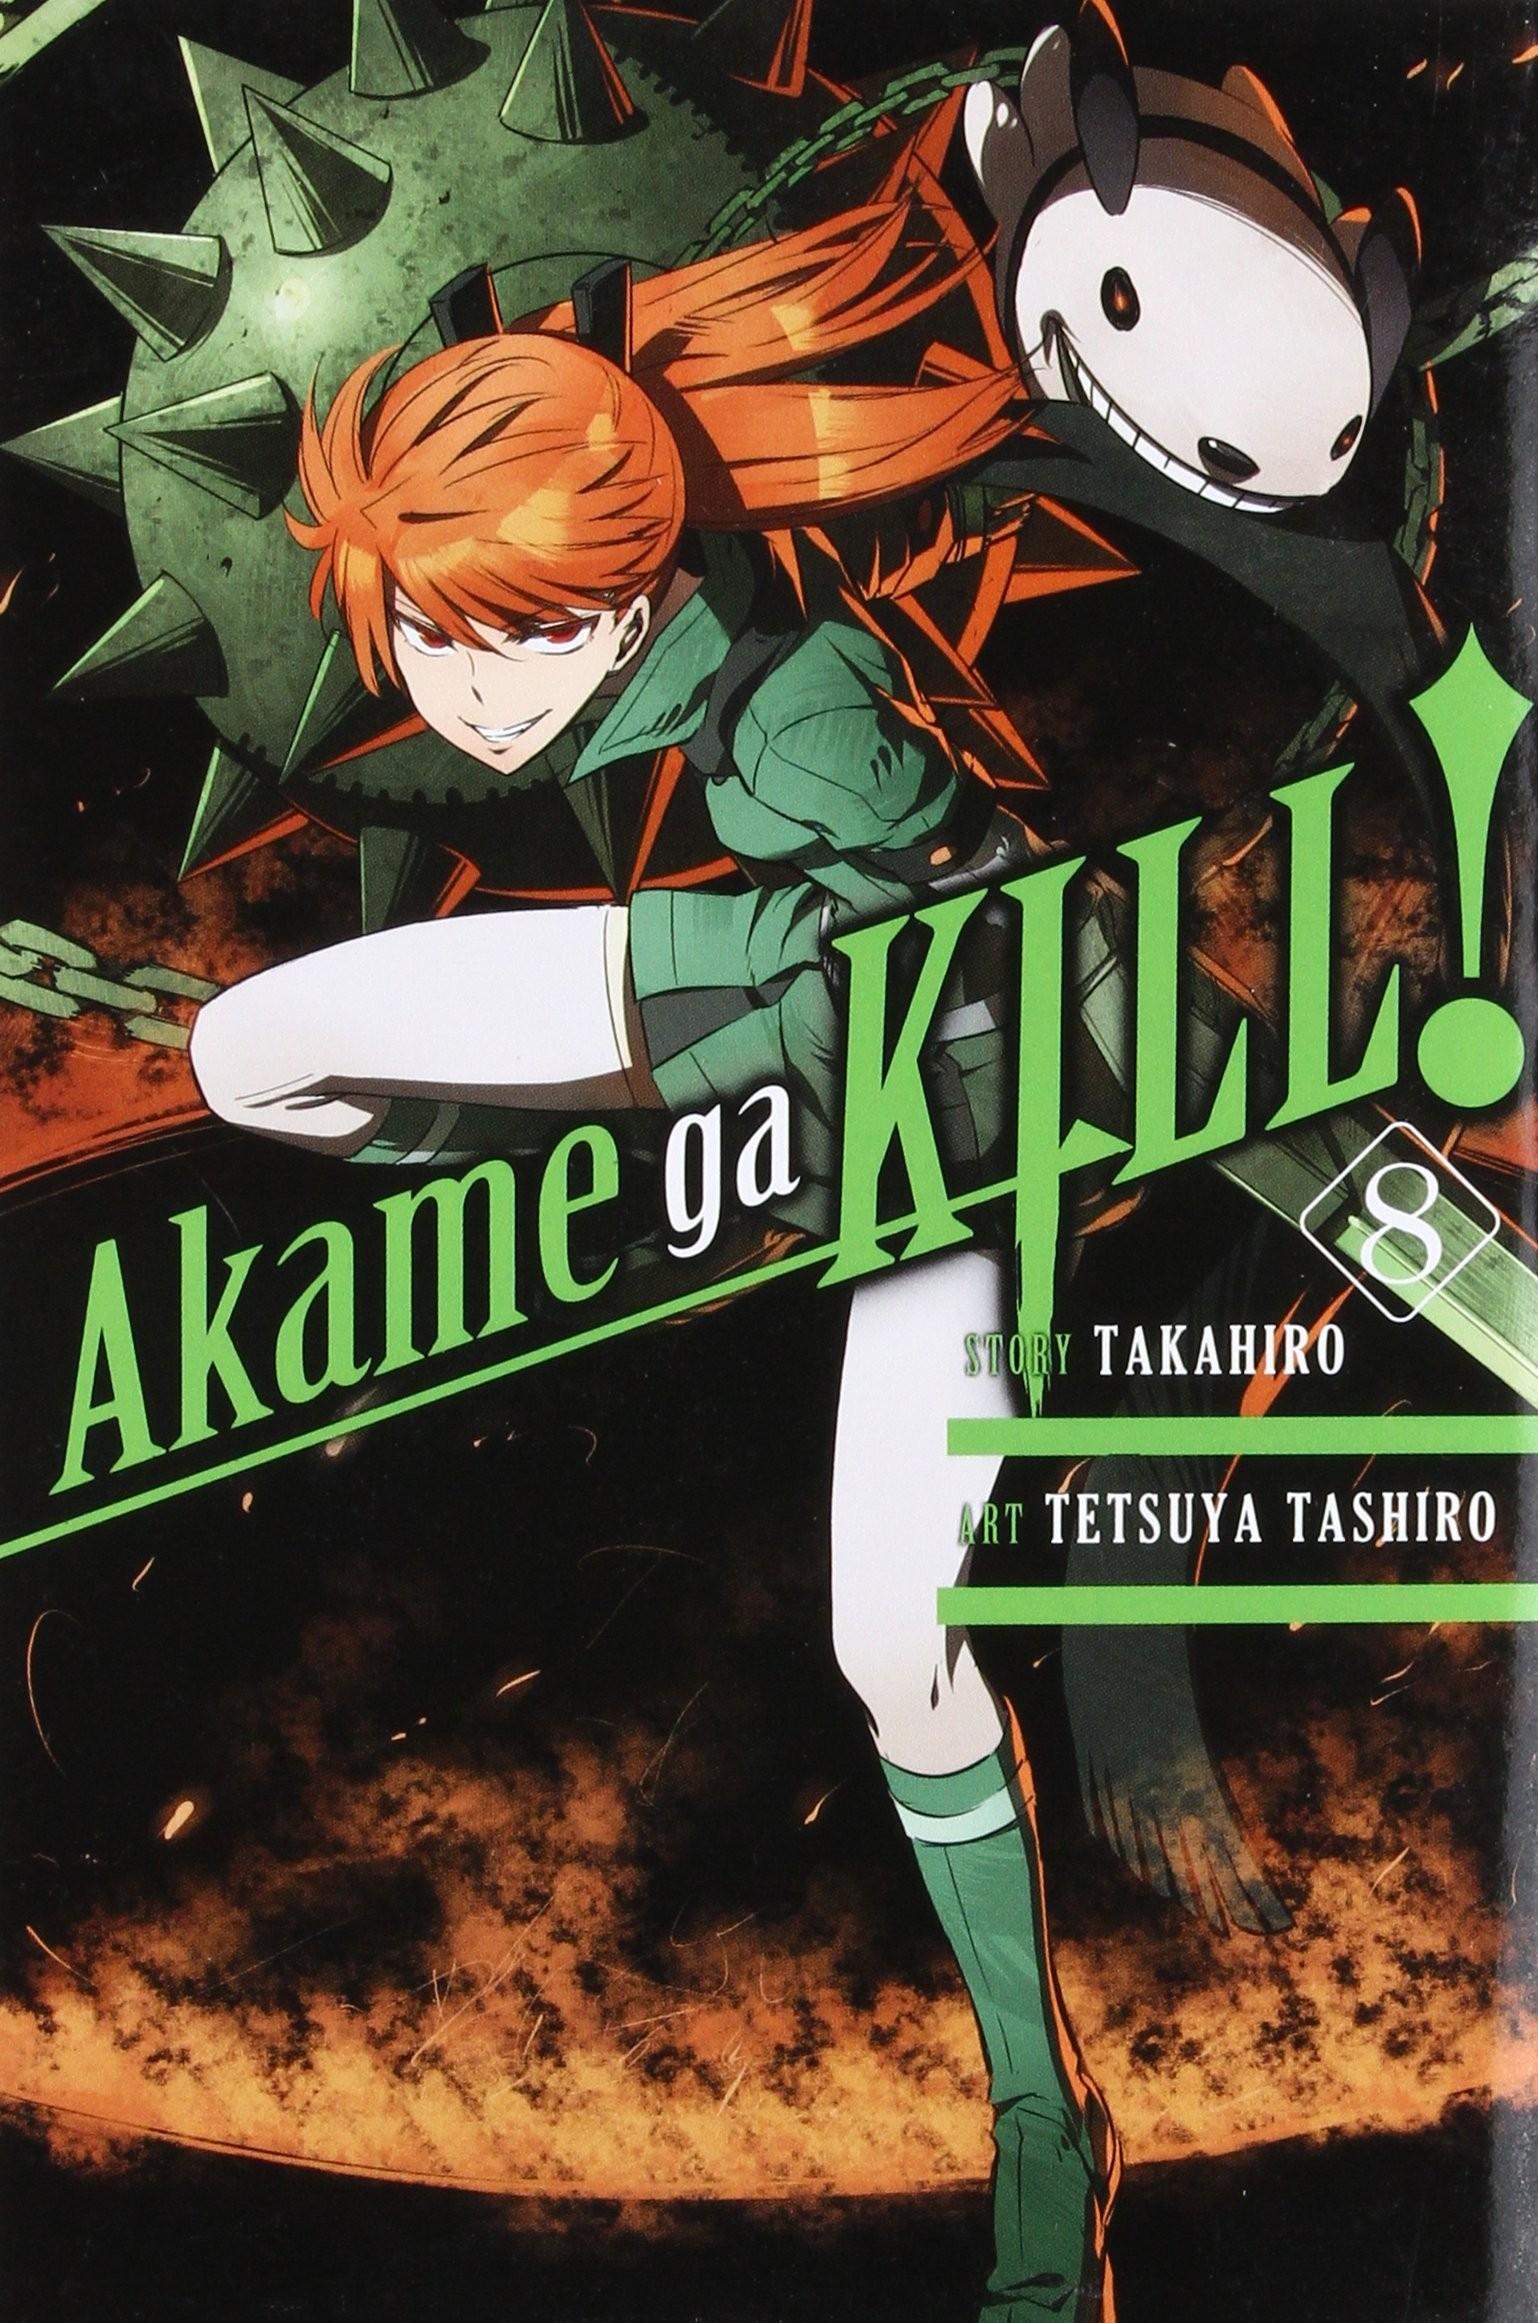 Akame ga Kill, Vol. 08 by Takahiro